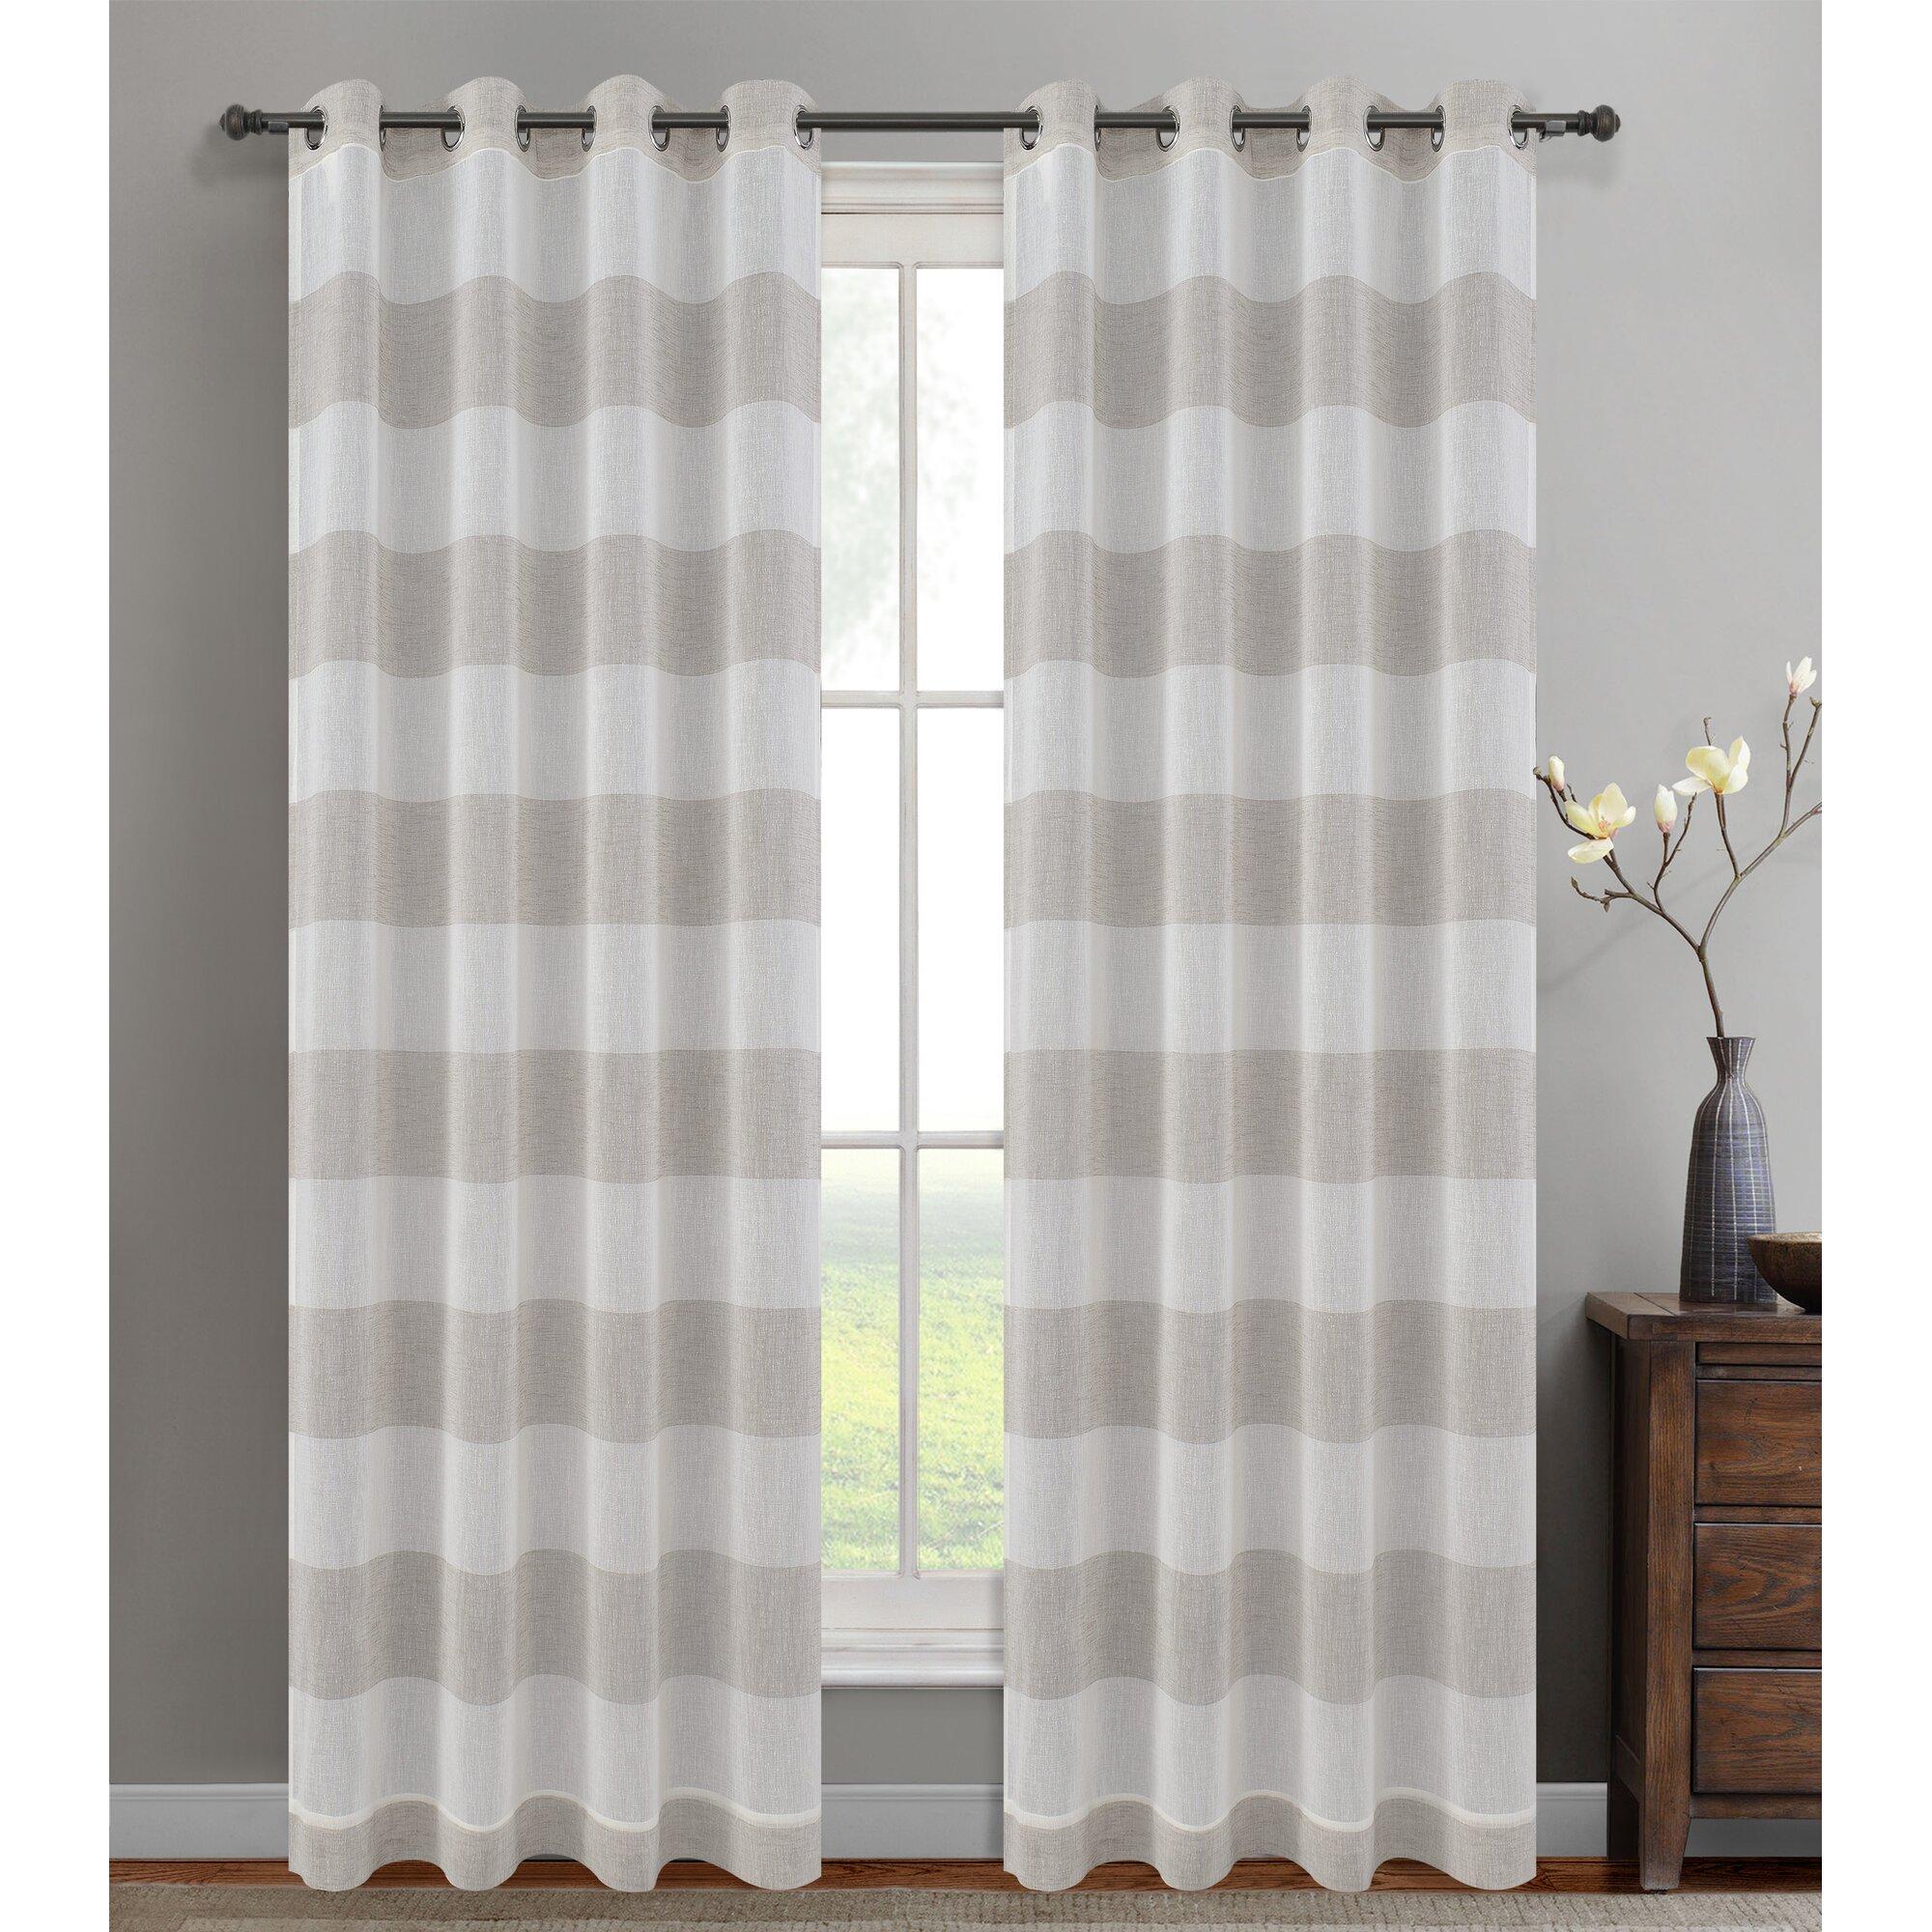 Urbanest Nassau Striped Sheer Grommet Curtain Panels